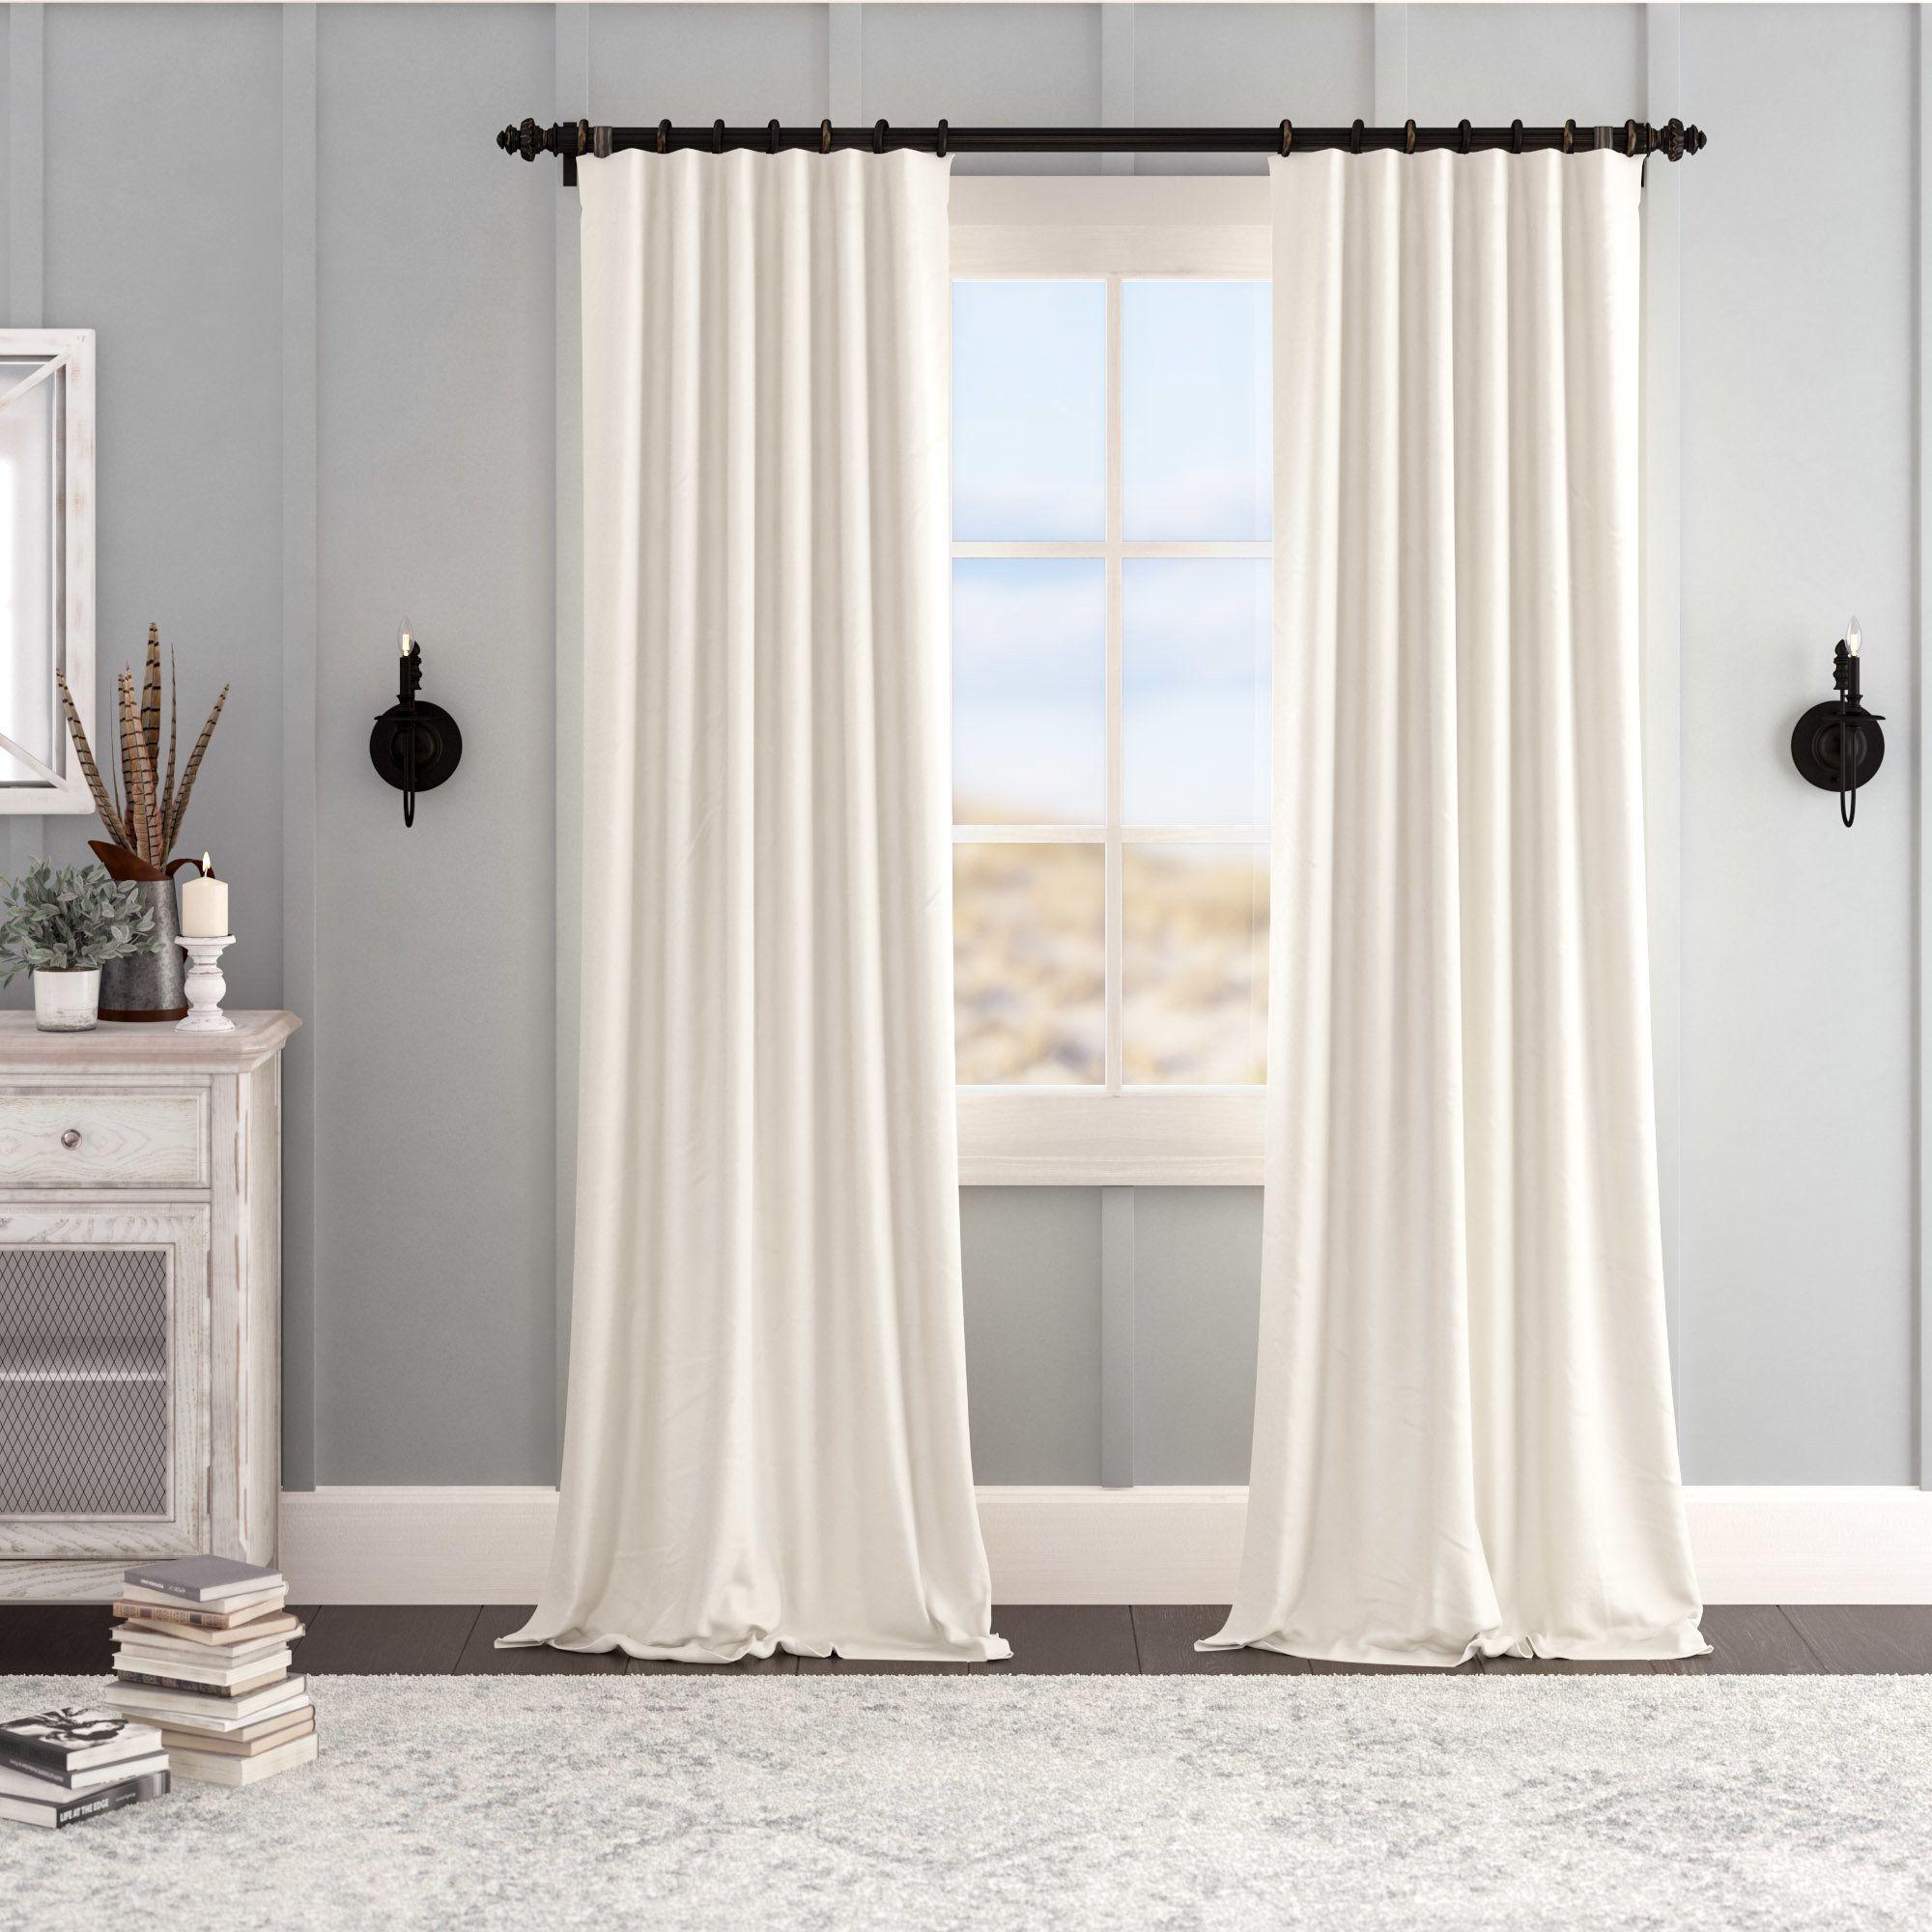 Laurel Foundry Modern Farmhouse Youati Ivory Gray Area Rug Reviews Wayfair Drapes Curtains Curtains Panel Curtains